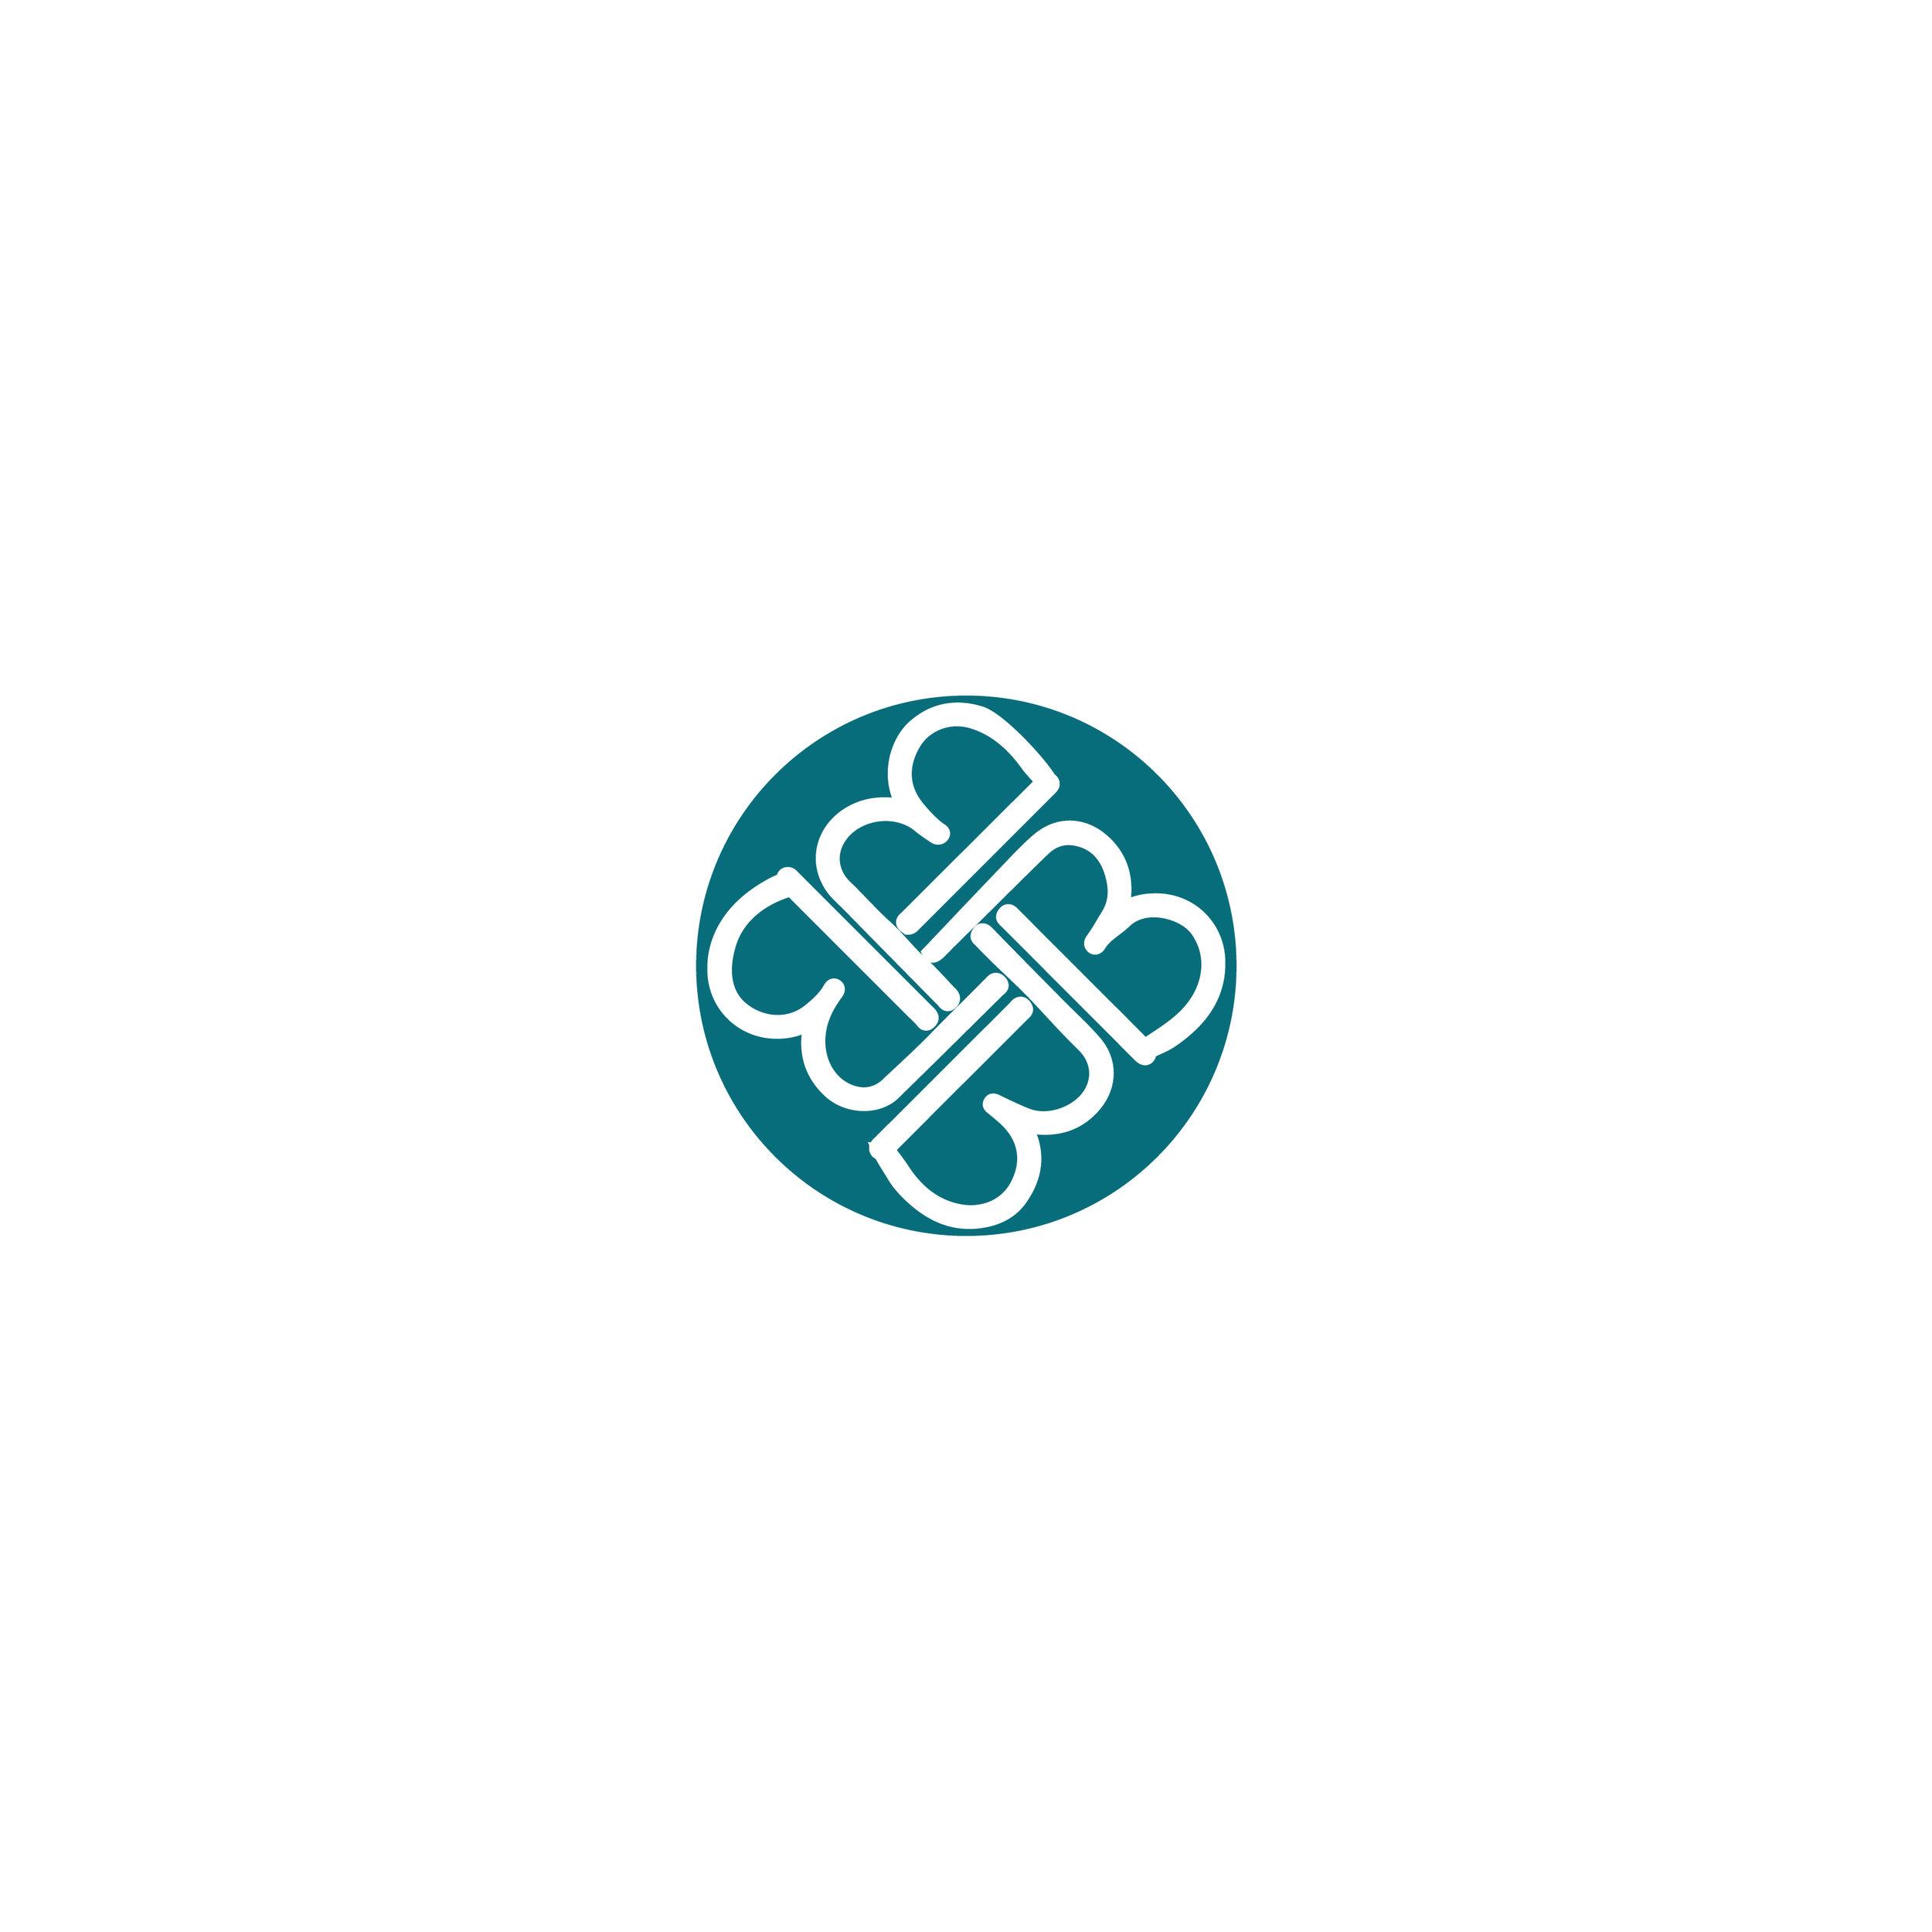 Teal Emblem Circle - for social feed copy 4.jpg